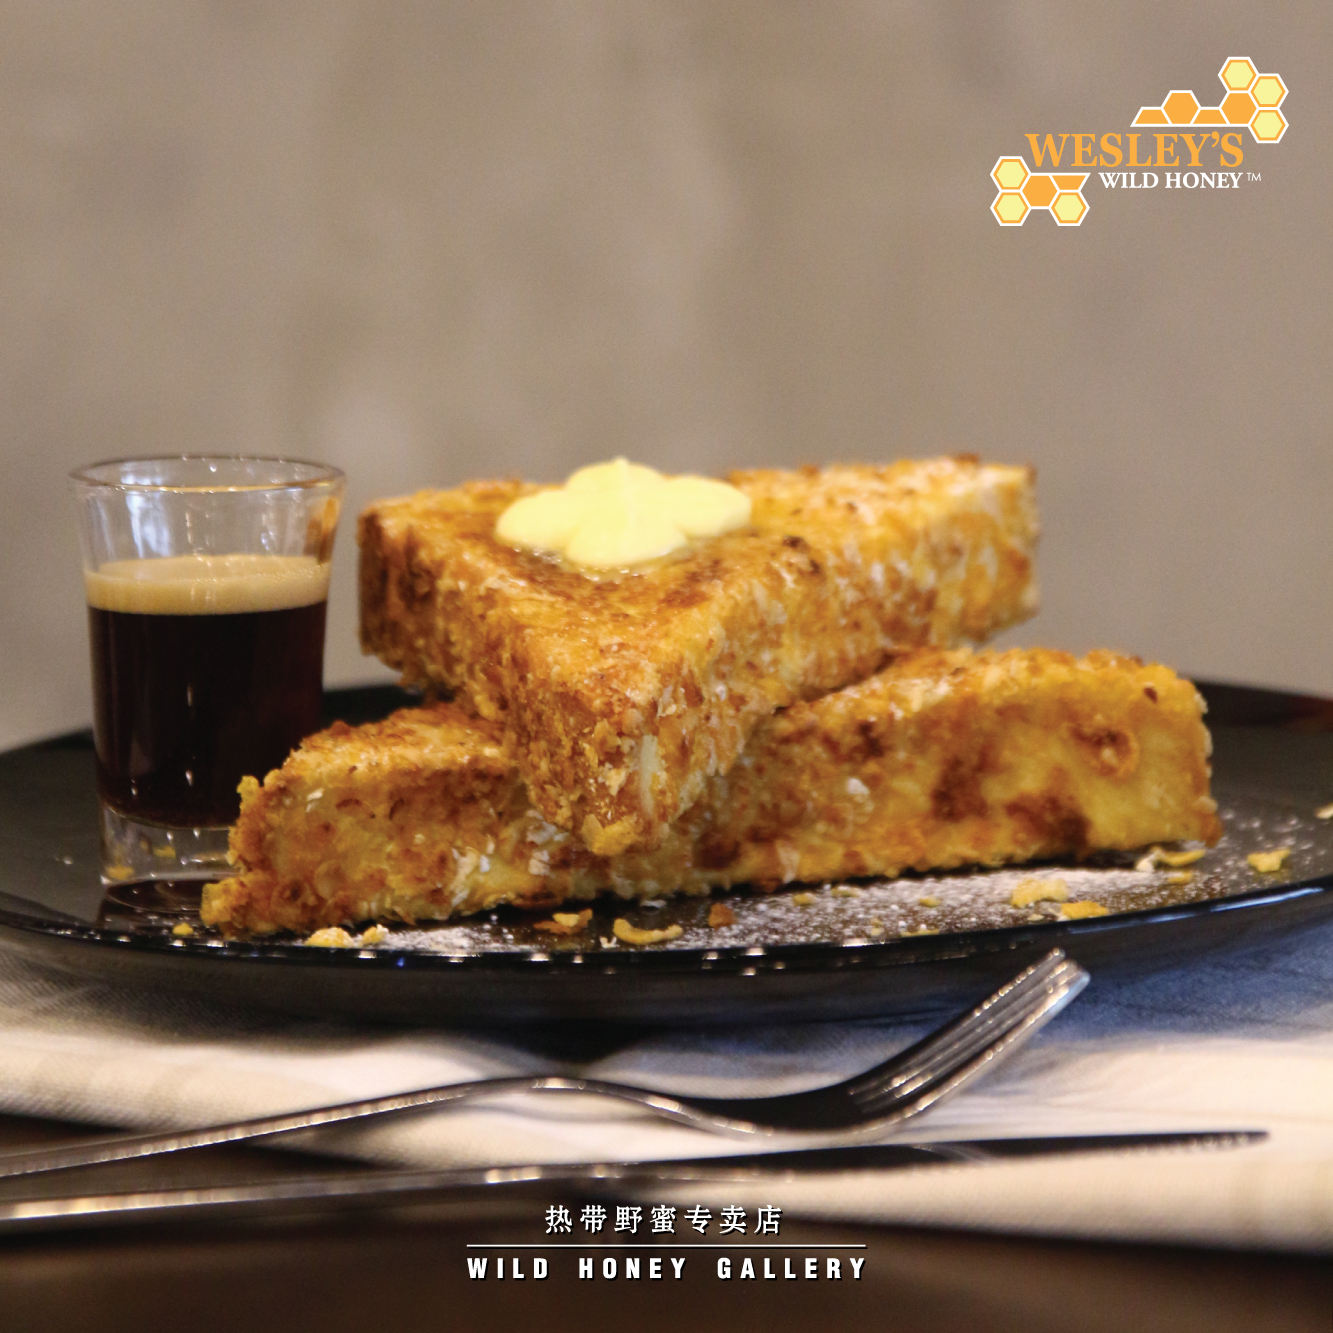 Crispy French Toast with Wild Honey